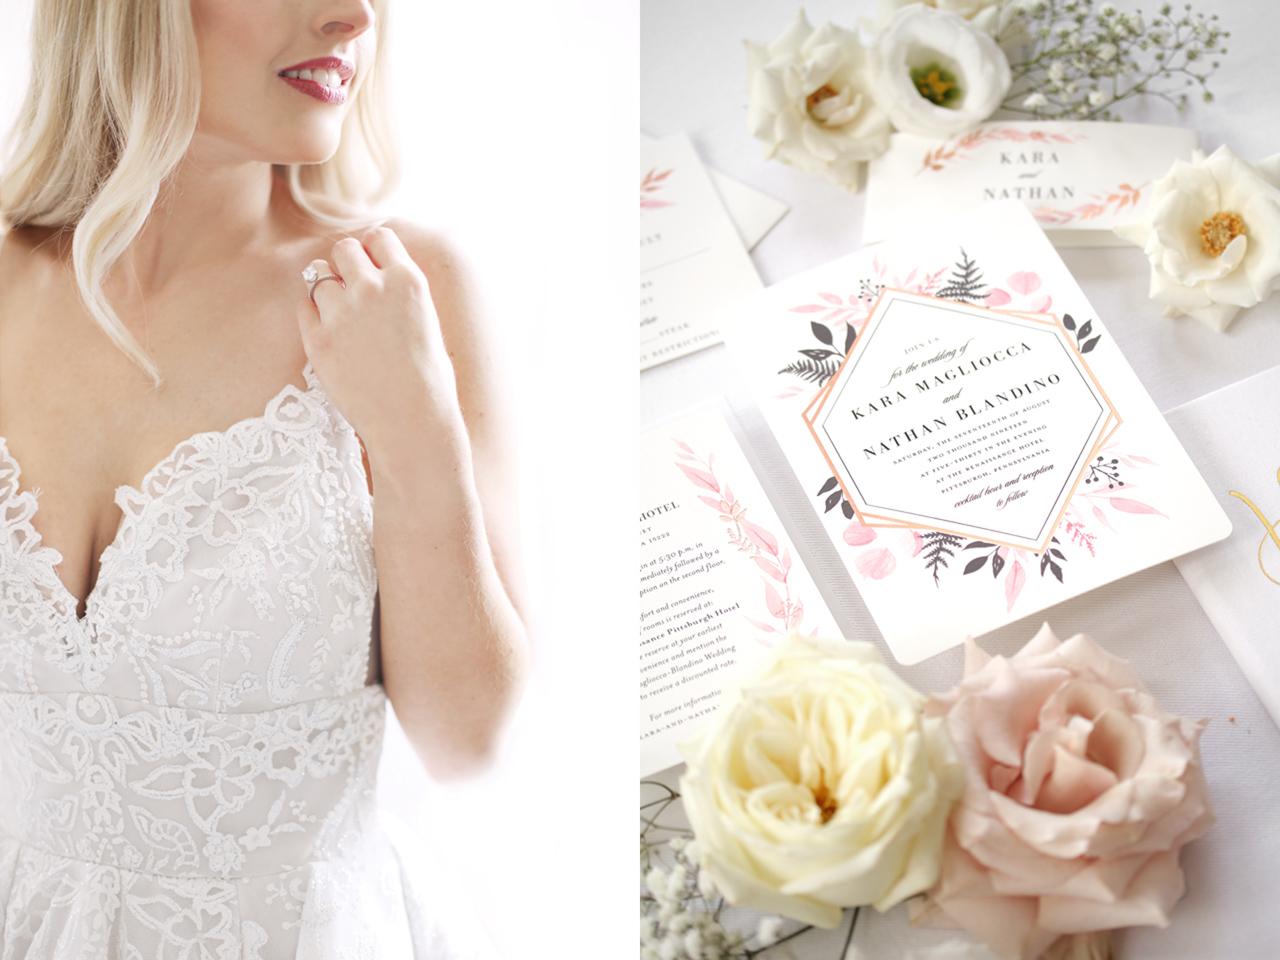 wedding invitation by araujo photo